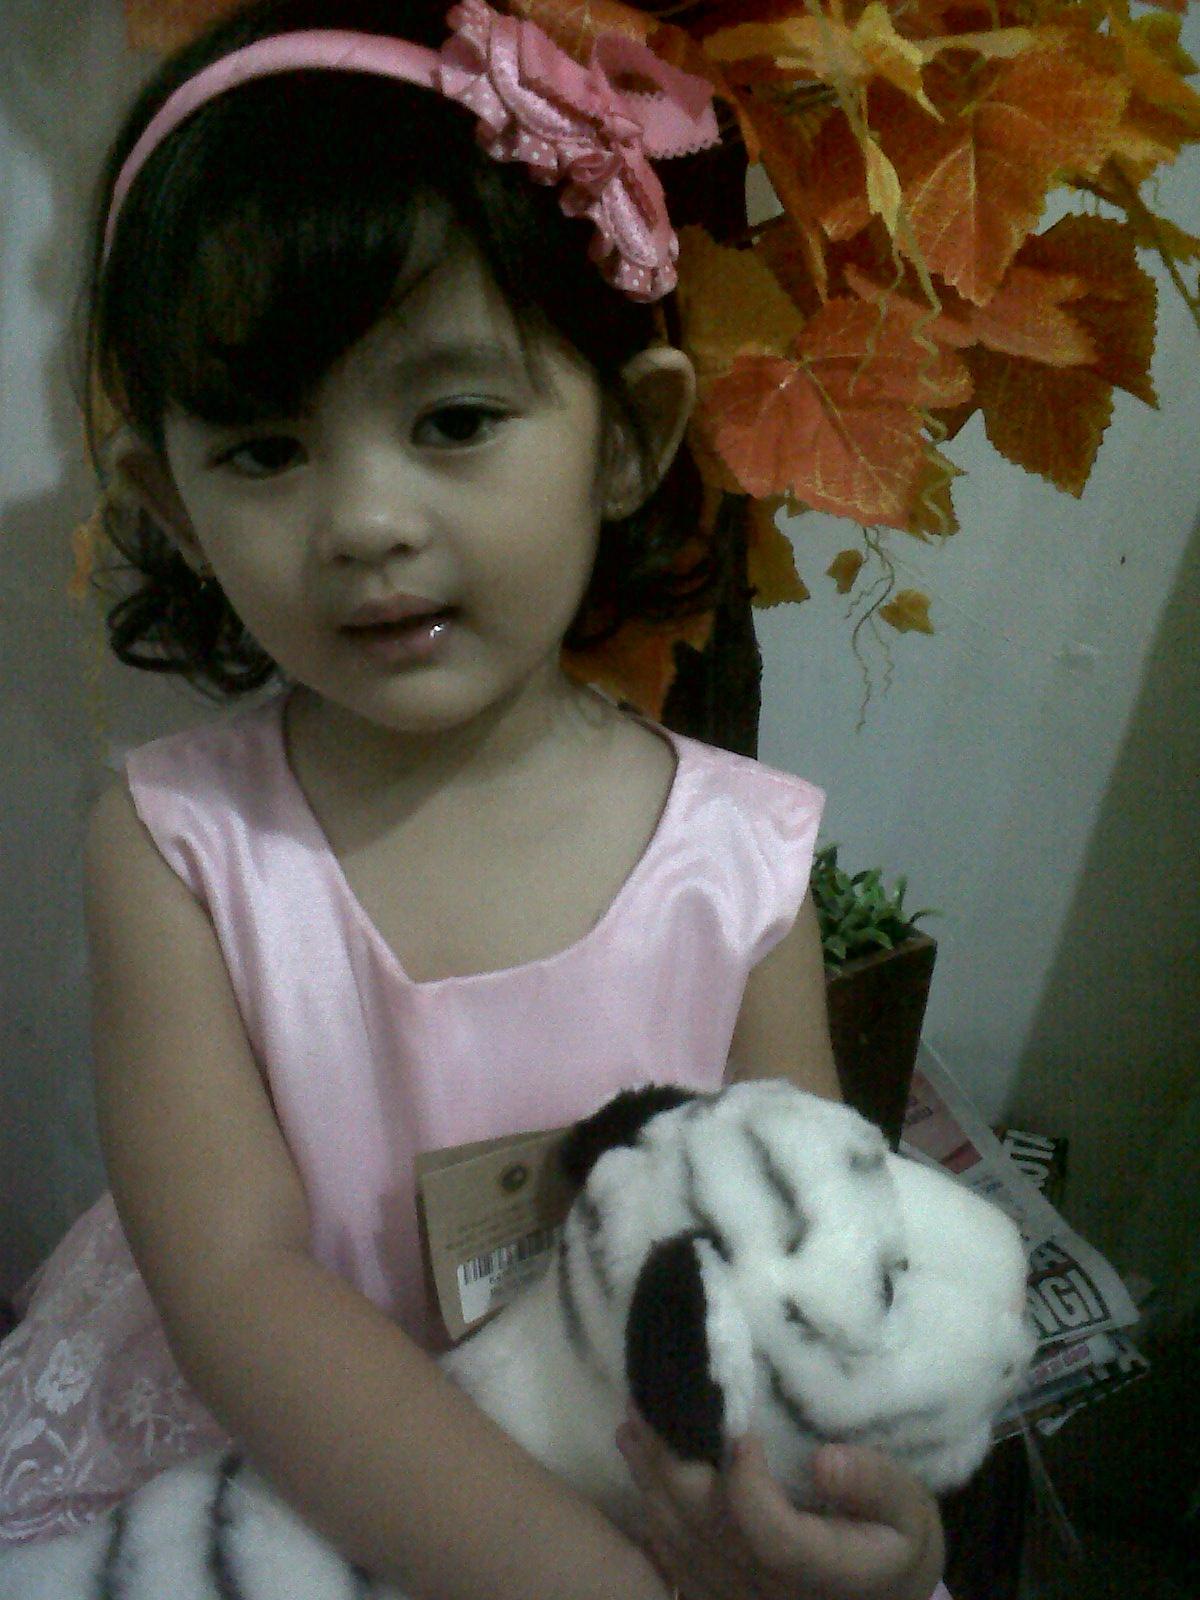 Foto Anak Yang Cantik Dan Lucu